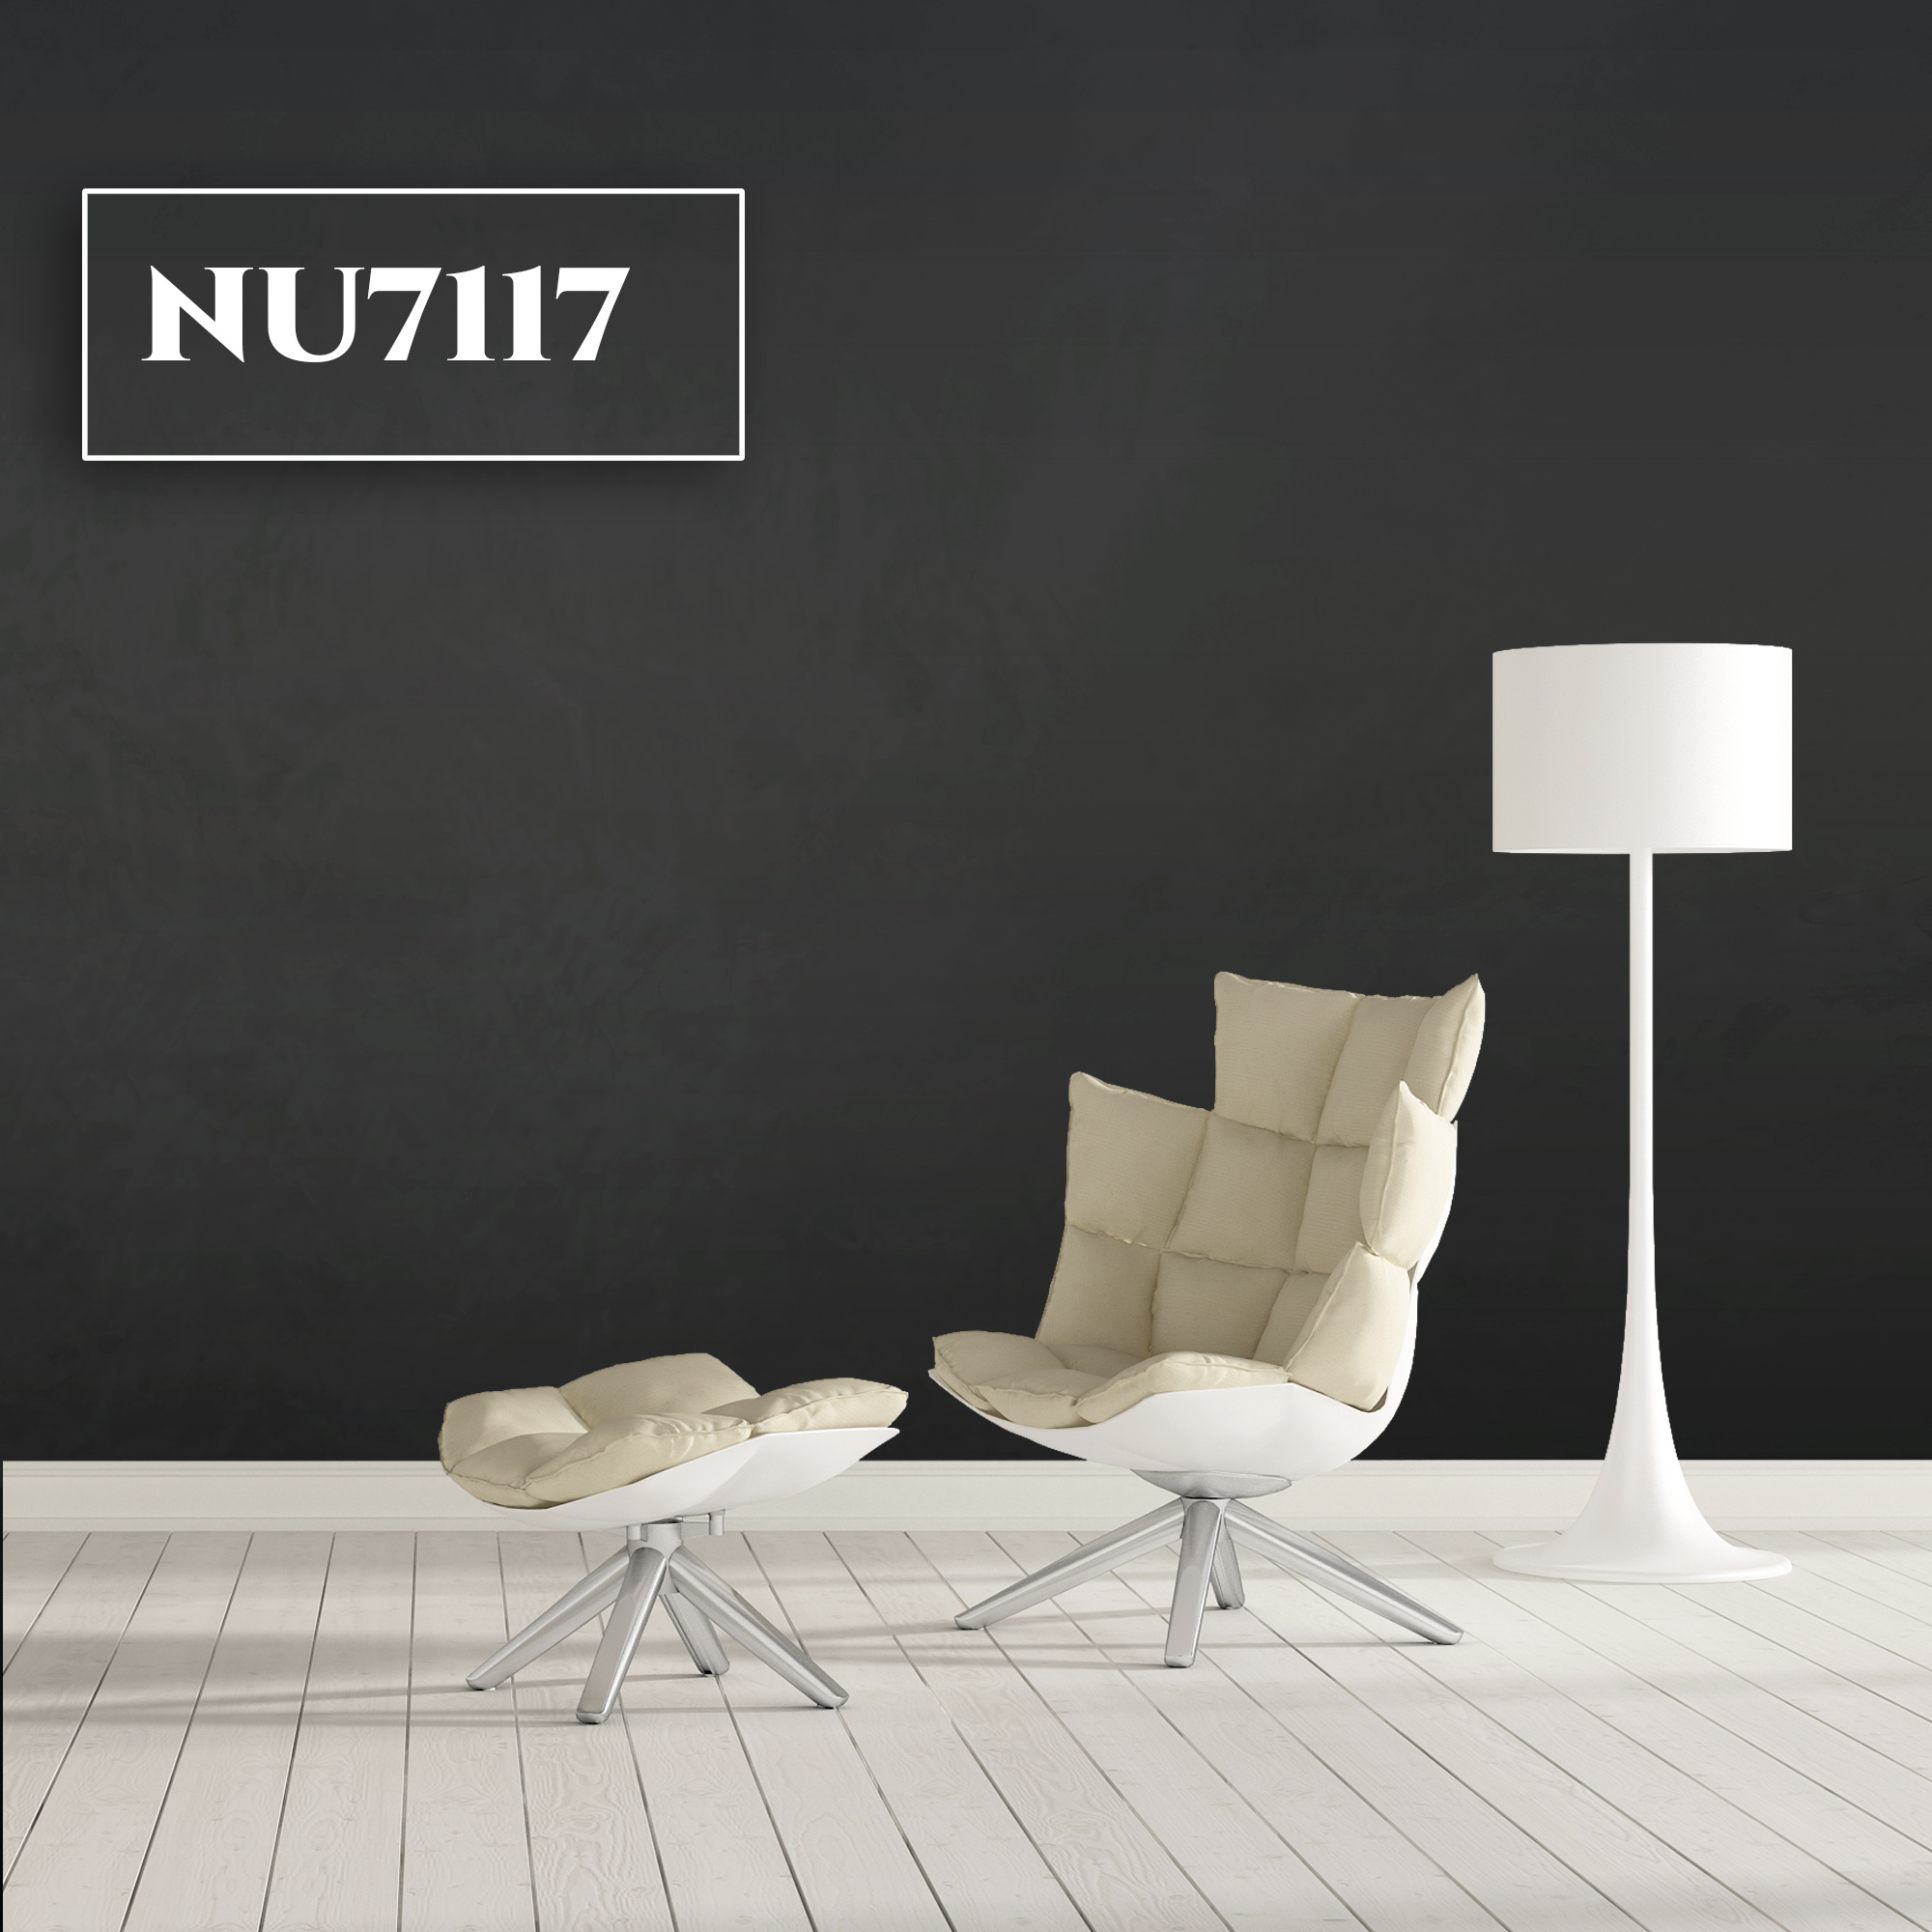 NU7117